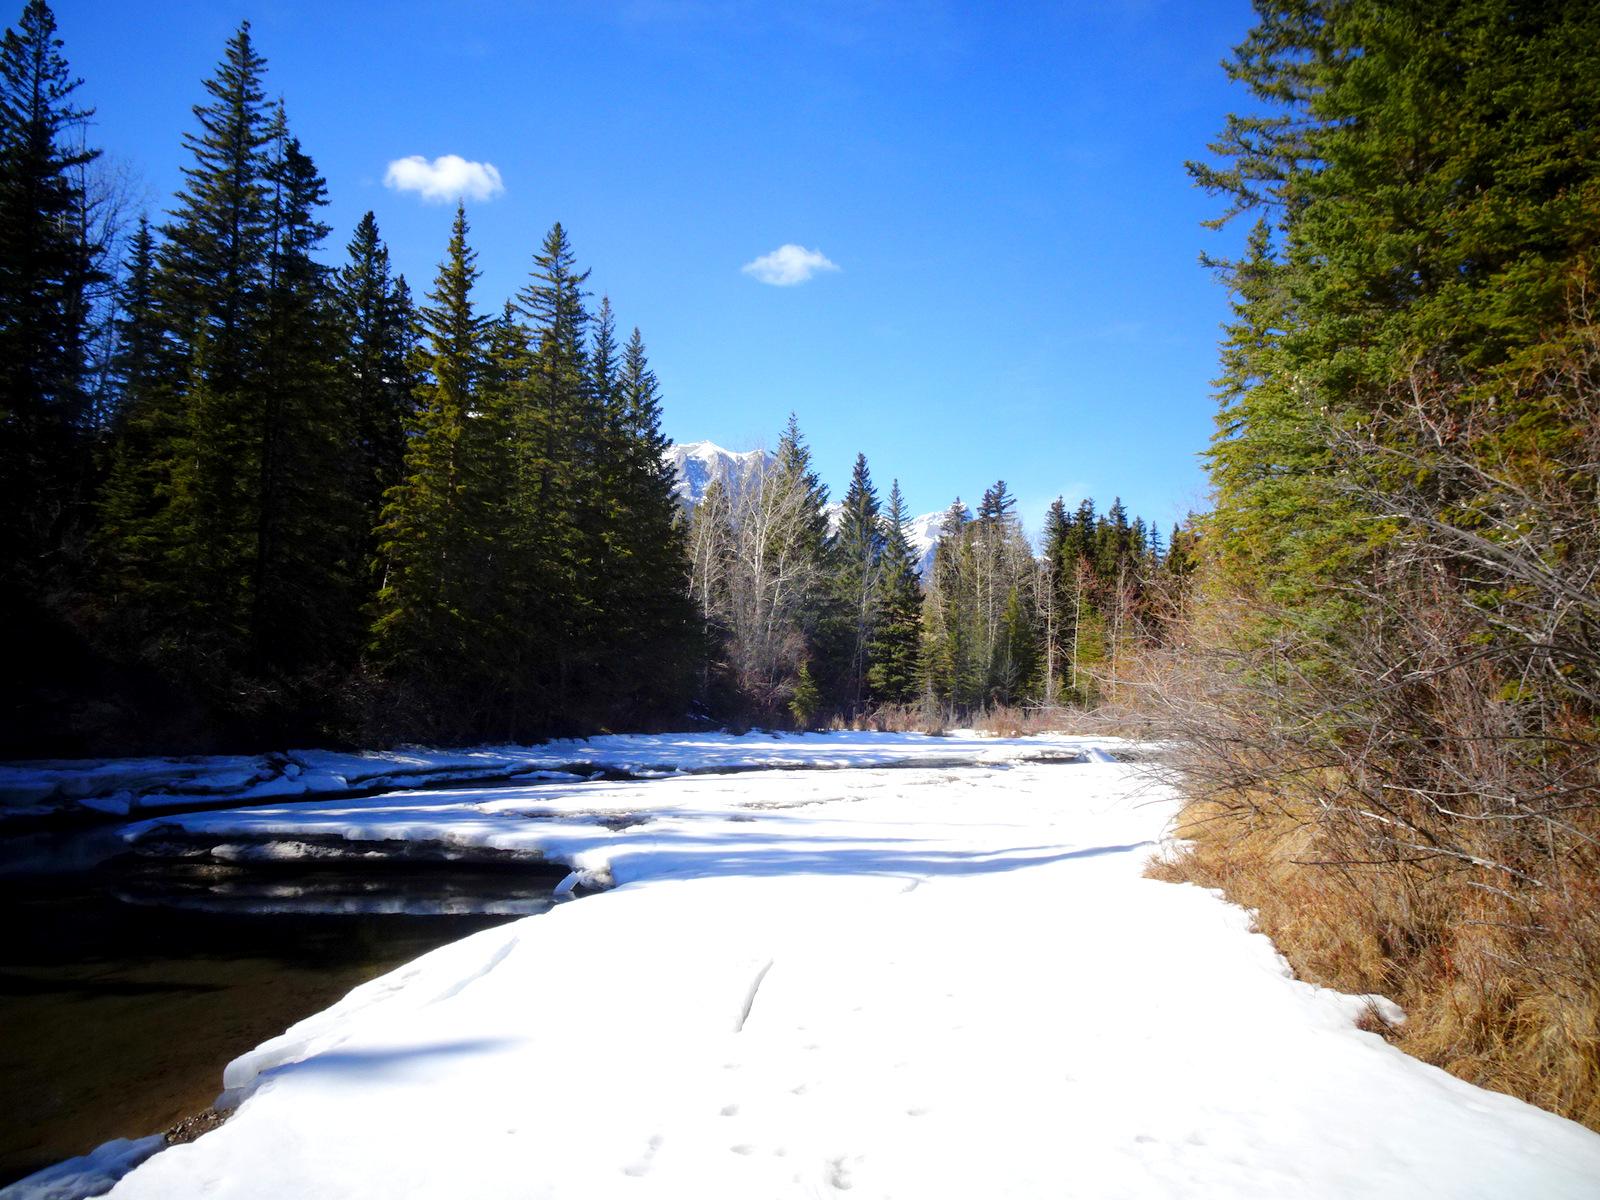 Bow River Eis